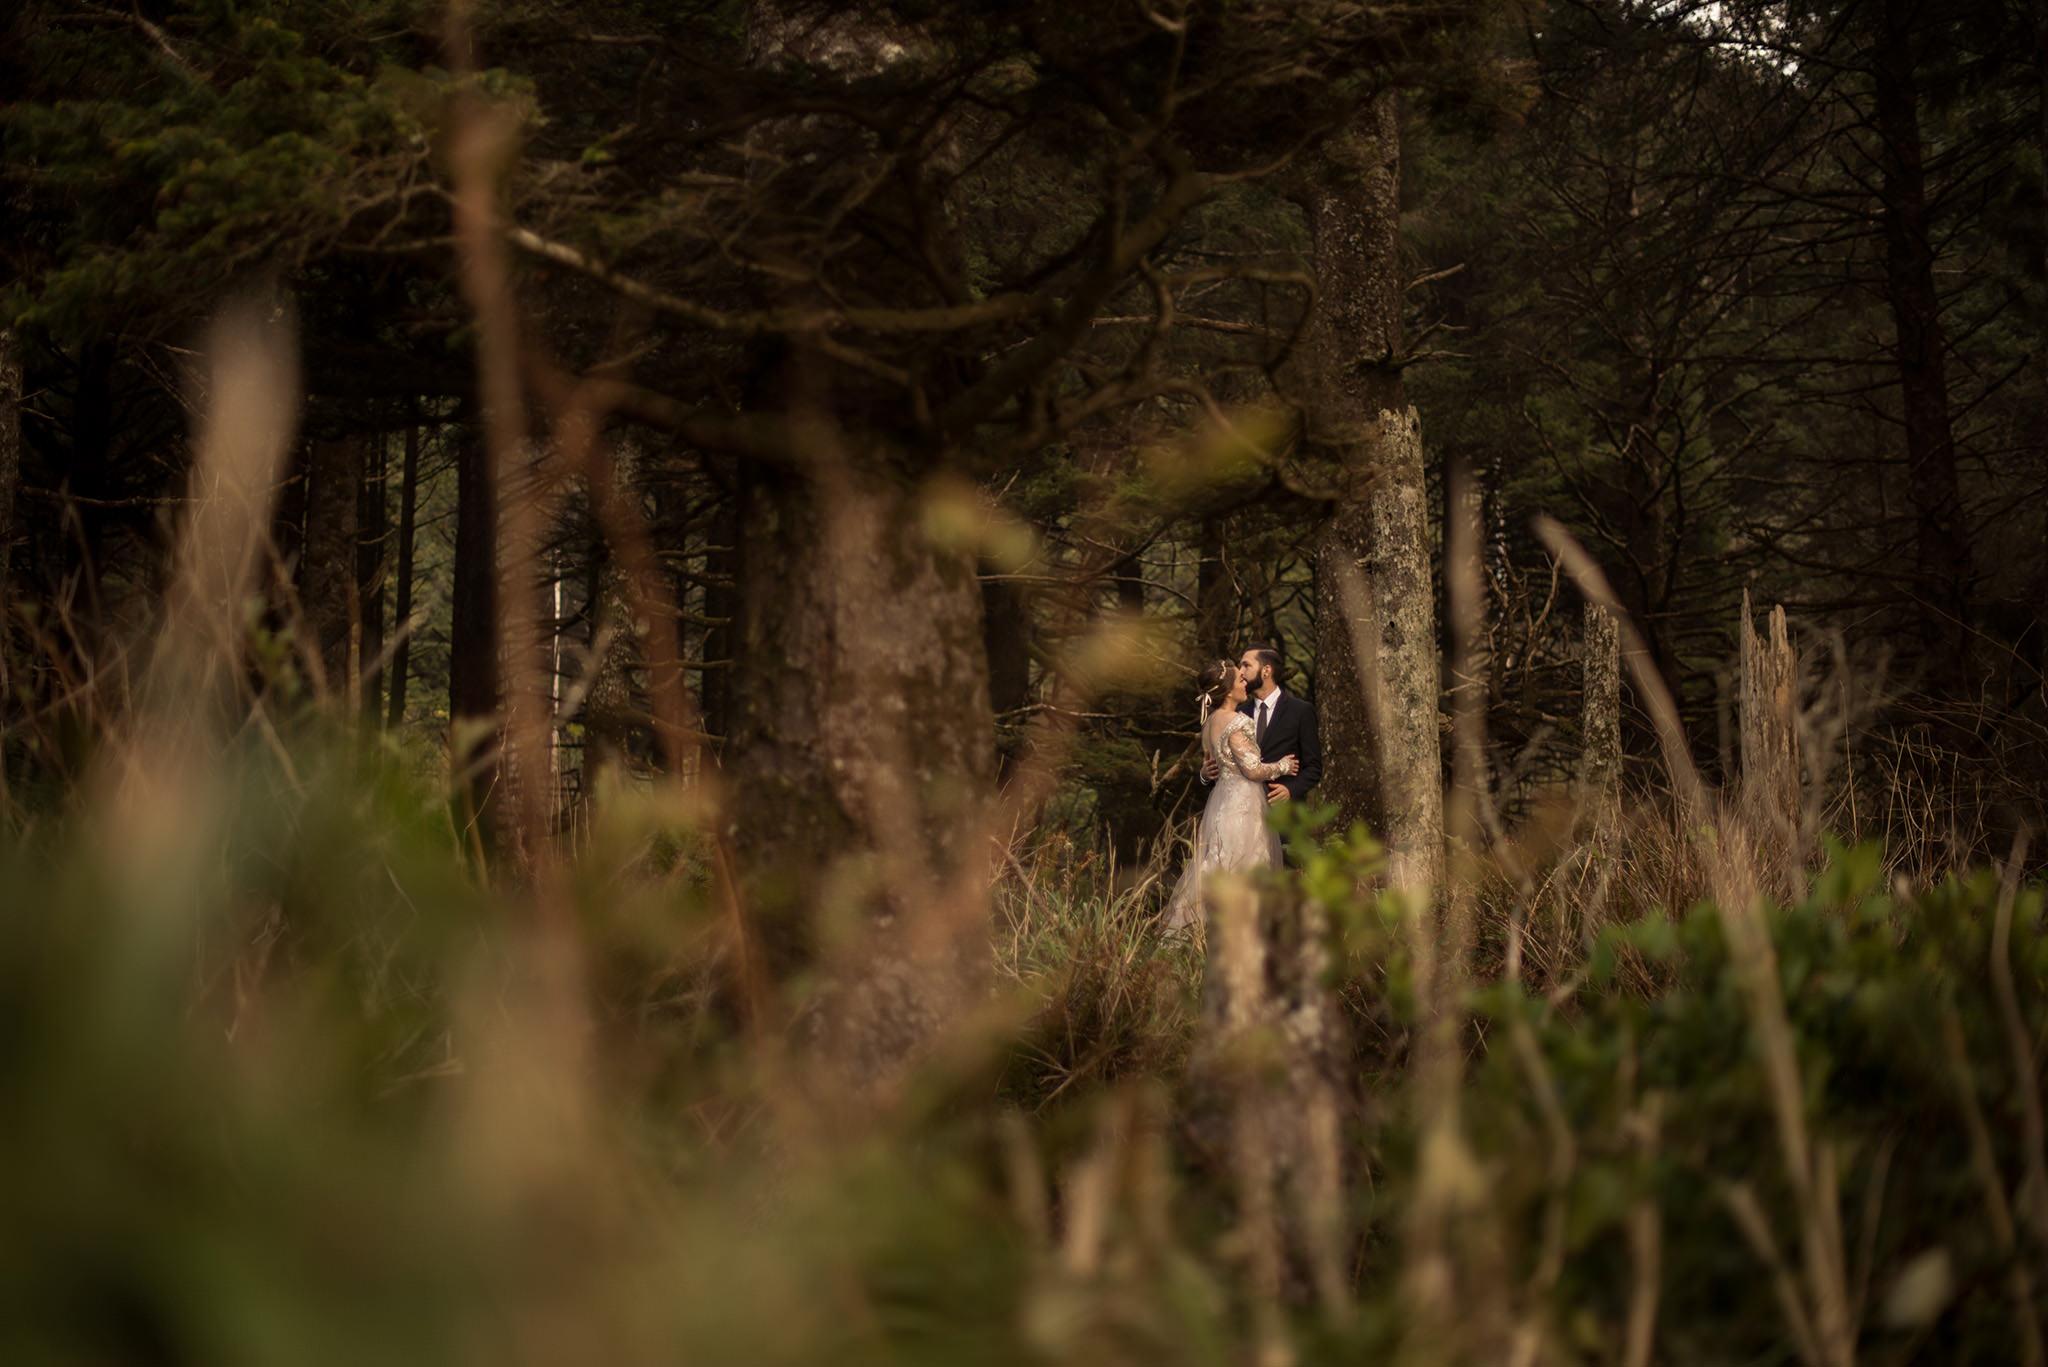 Hug-point-oregon-elopement-engagement-beach-photographer-1